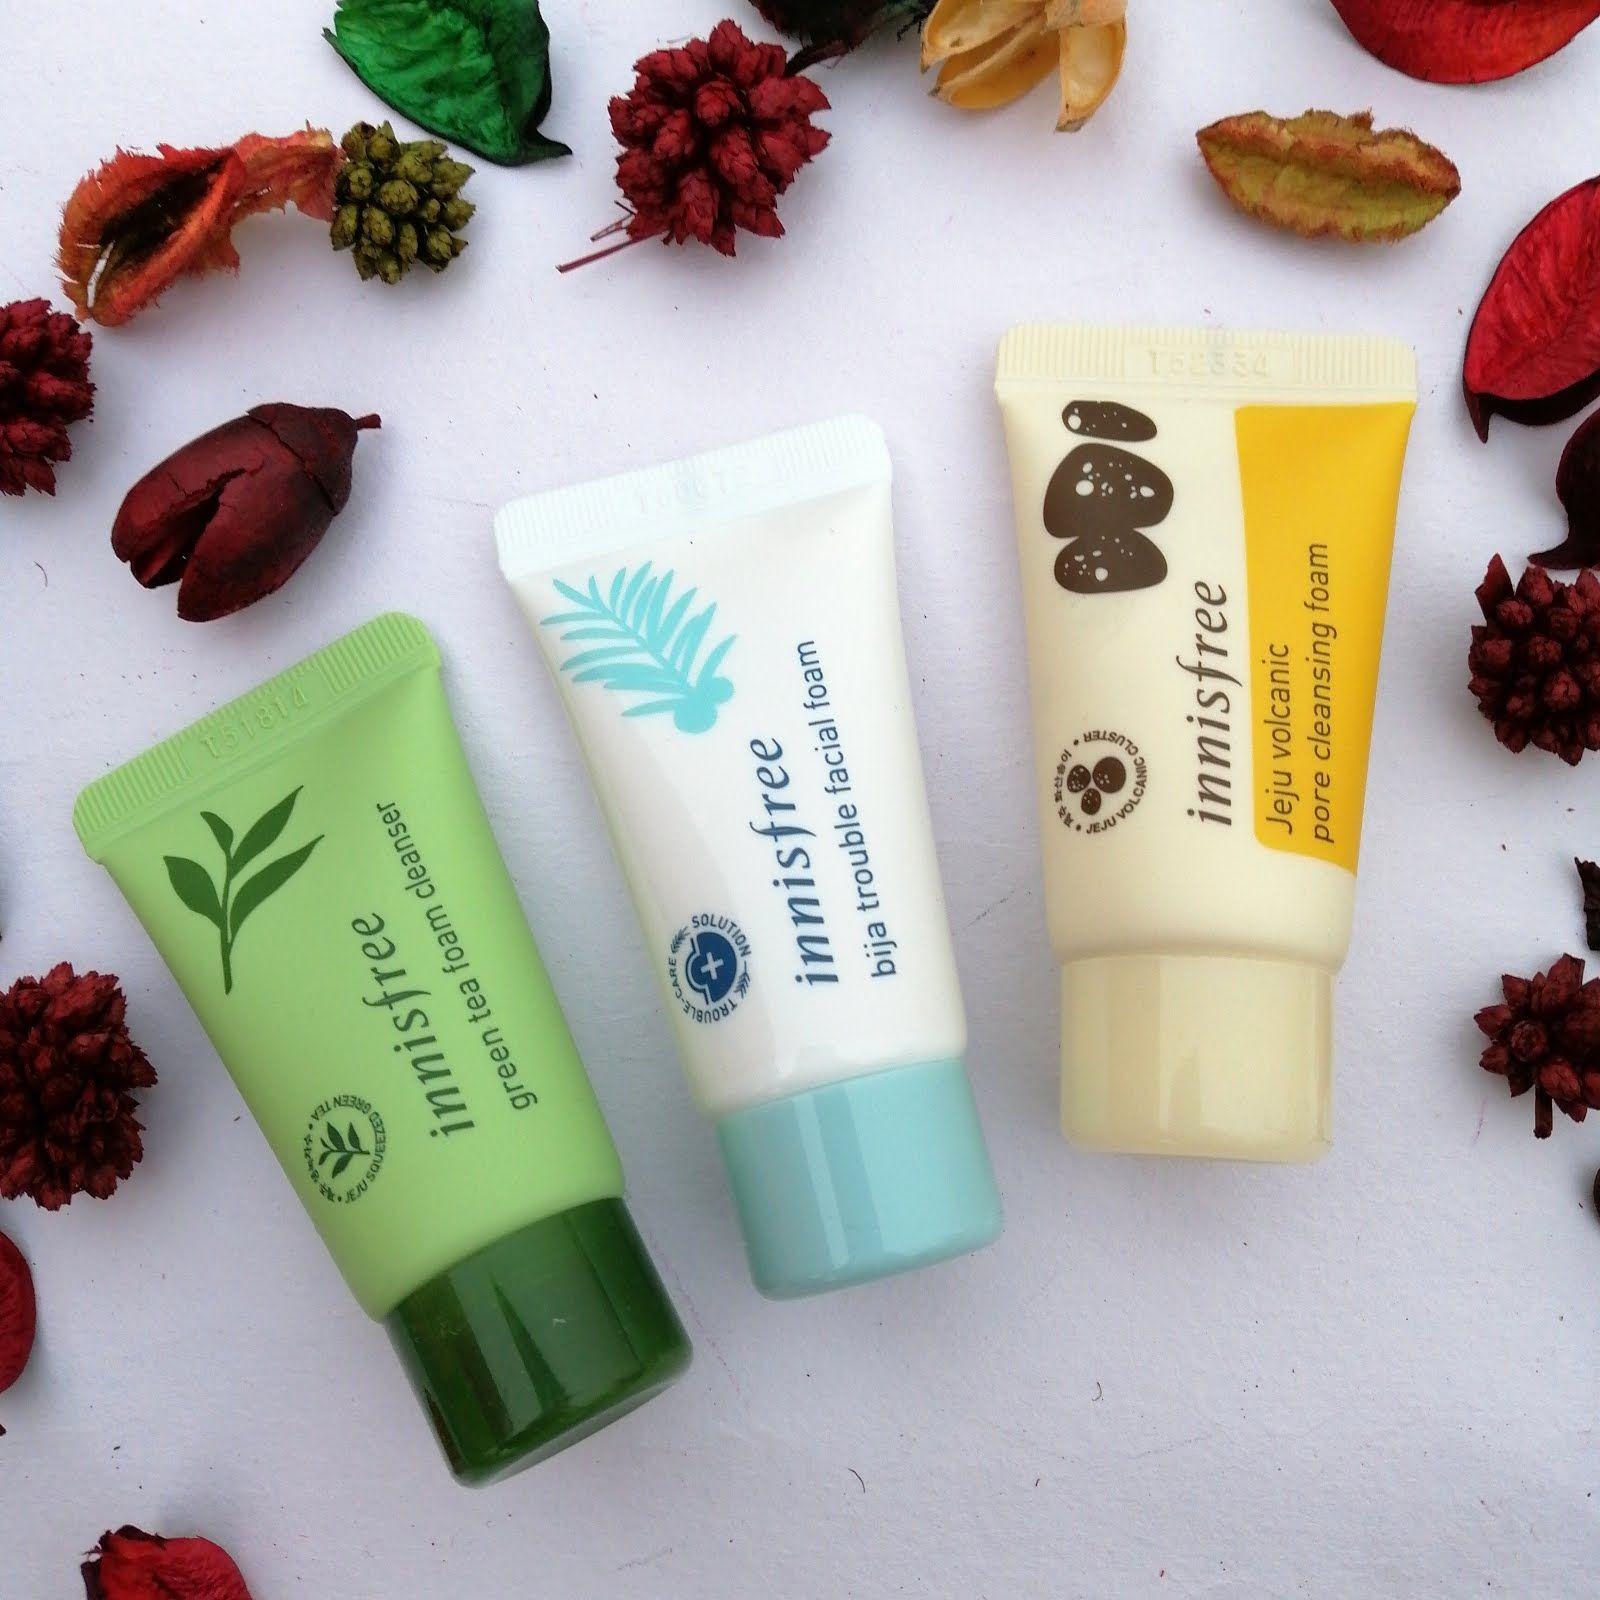 Innisfree Cleansing Foam Trial Kit Review Innisfree Innisfree Skincare Korean Skincare Acne